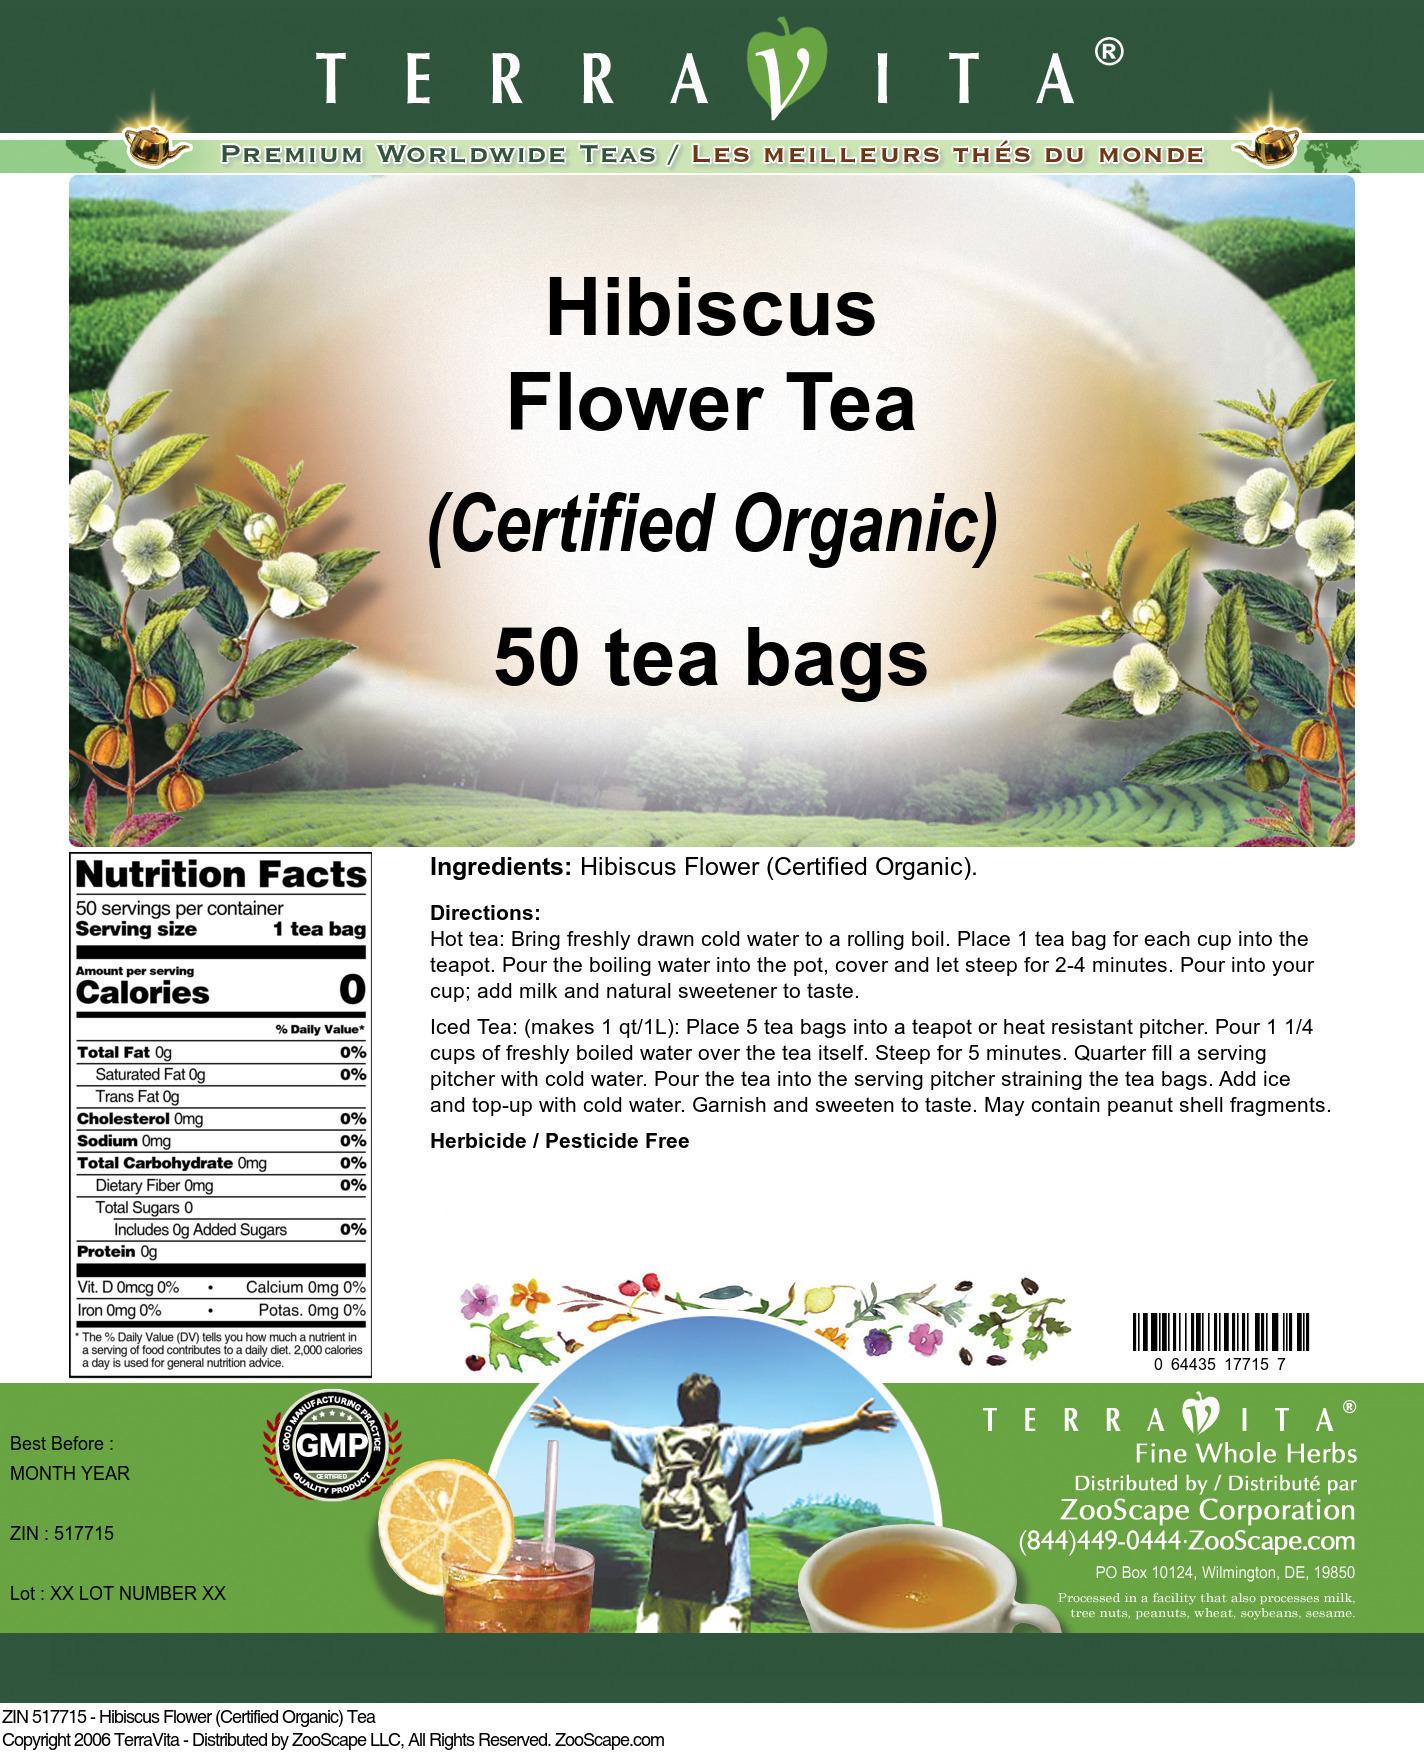 Hibiscus Flower (Certified Organic) Tea - Label